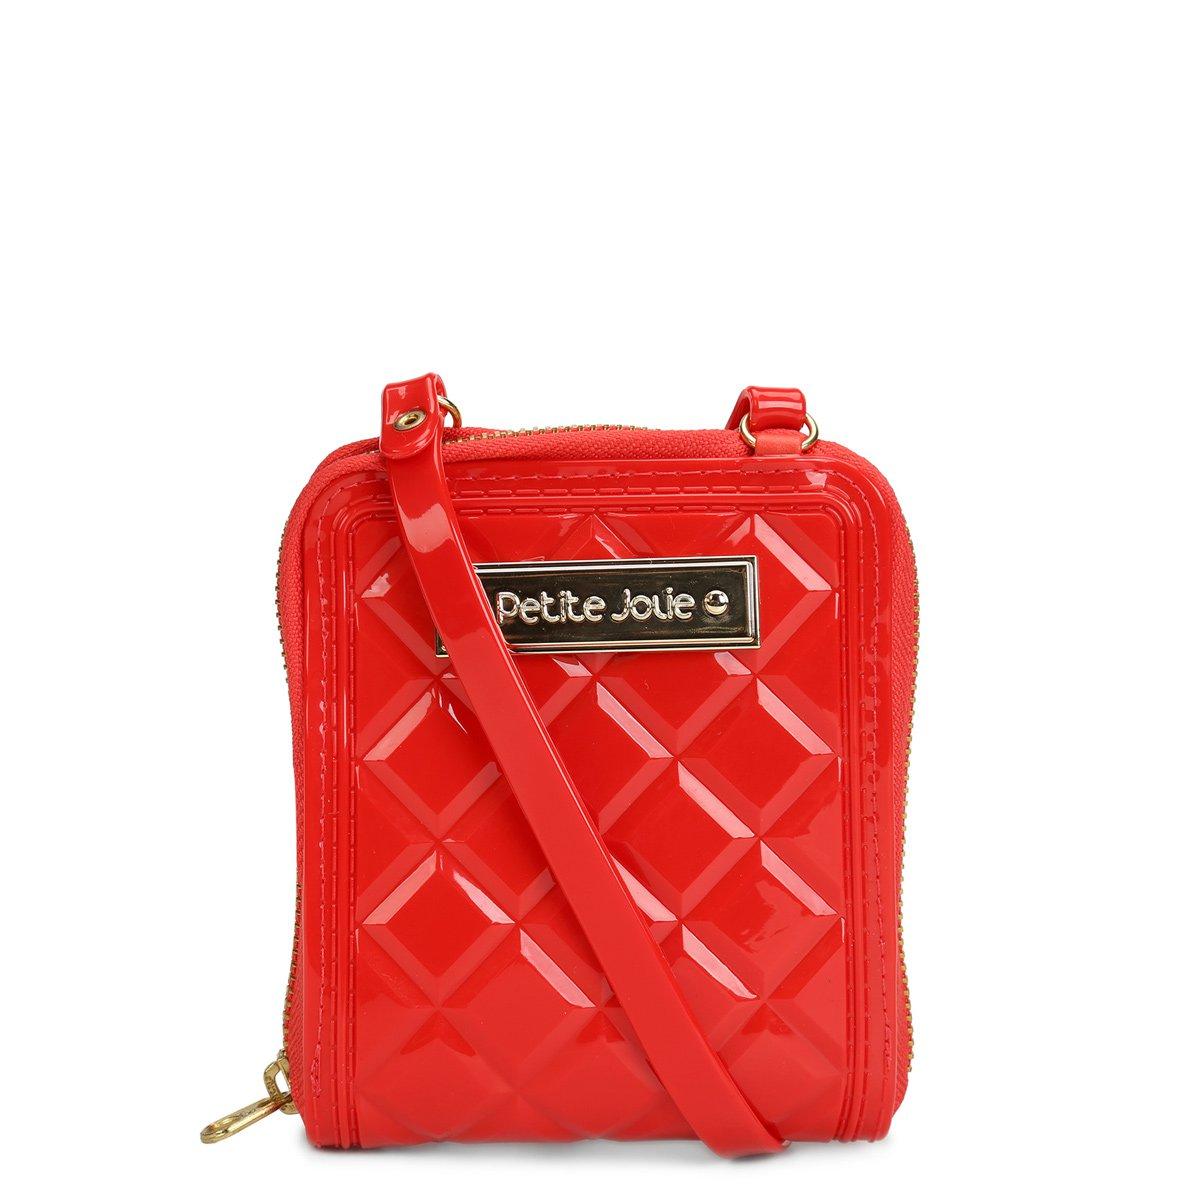 841a90014 Bolsa Petie Jolie Transversal - Compre Agora | Zattini